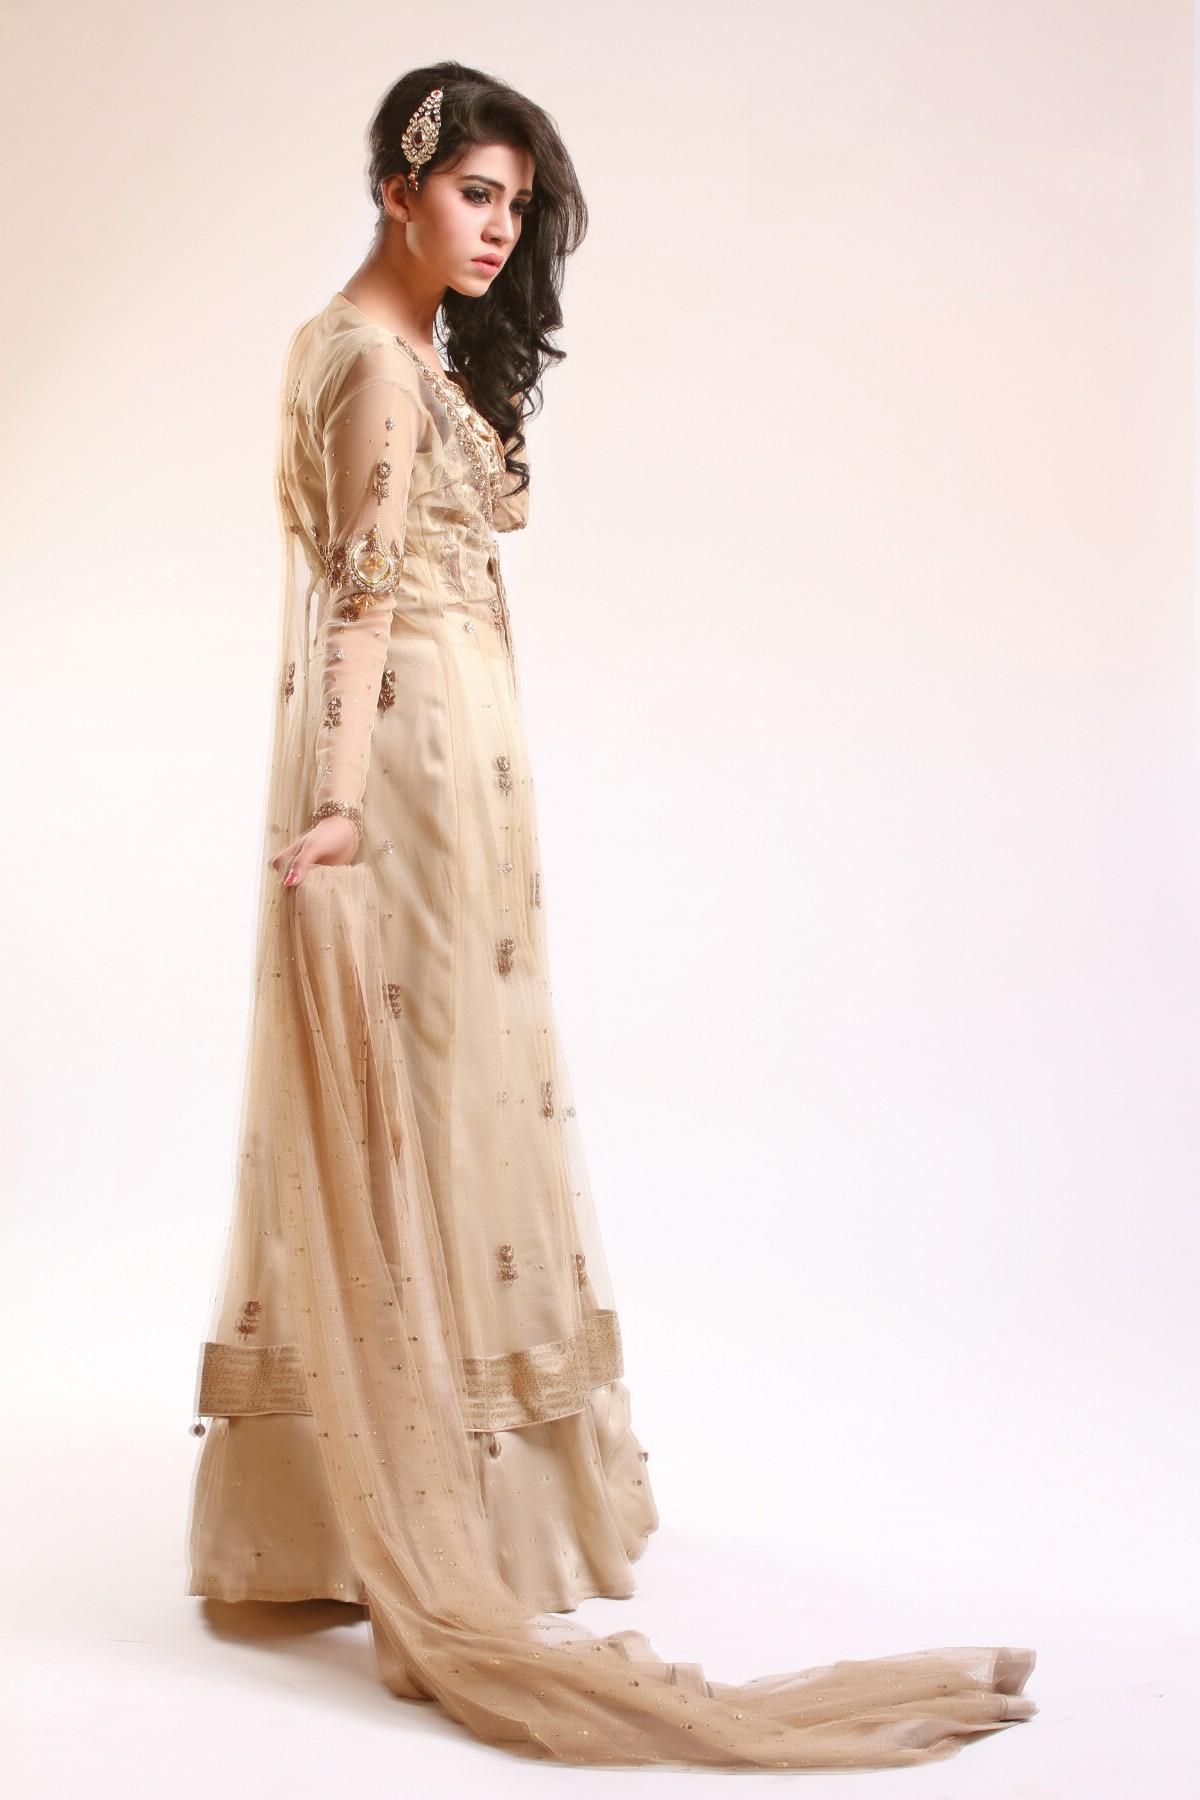 Honeymoon clothes for women